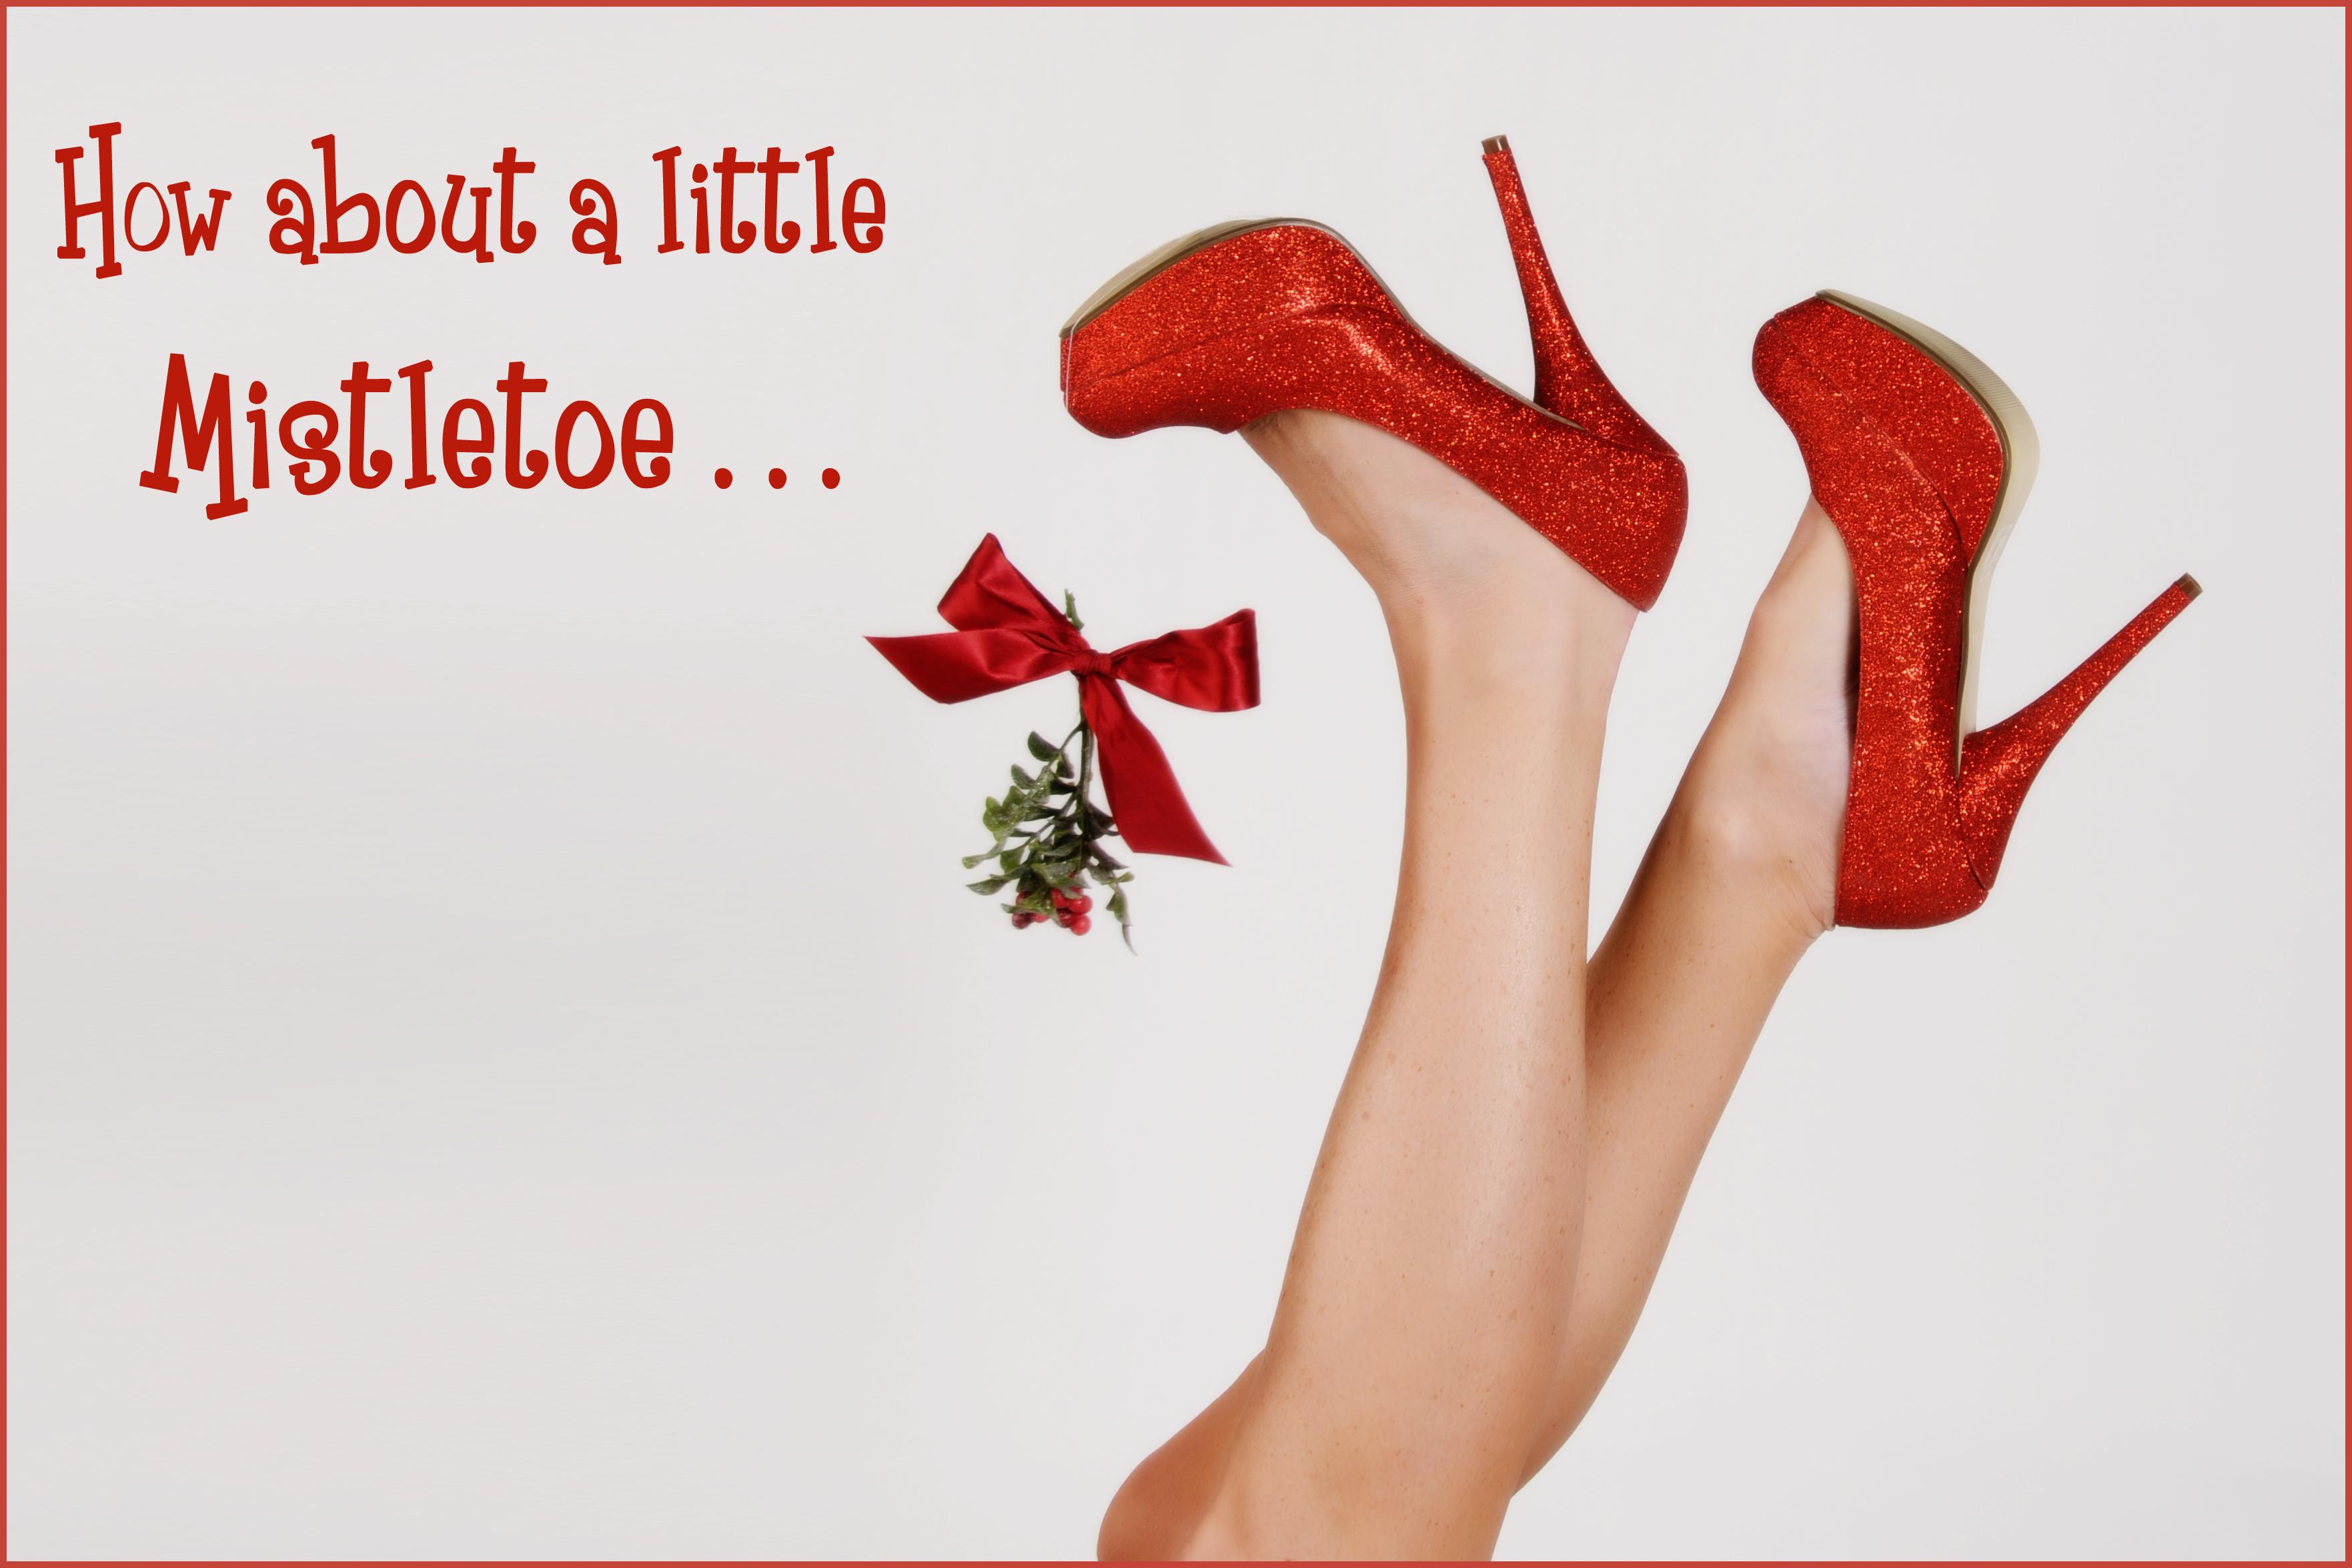 Mistletoe kiss sexy images